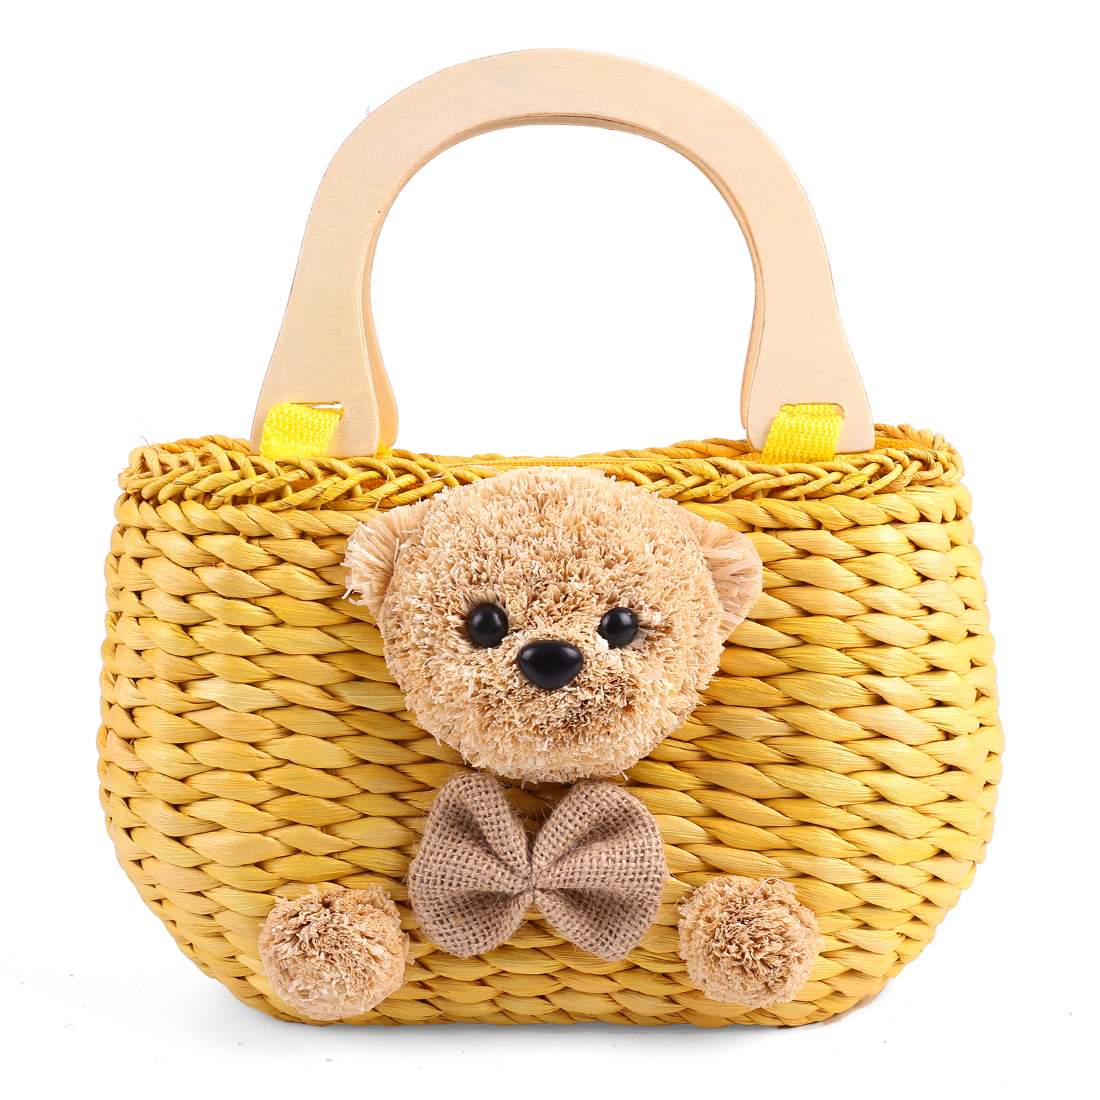 Stylish Light Yellow Solid Bear Decor Woven Straw Handbag for Girls